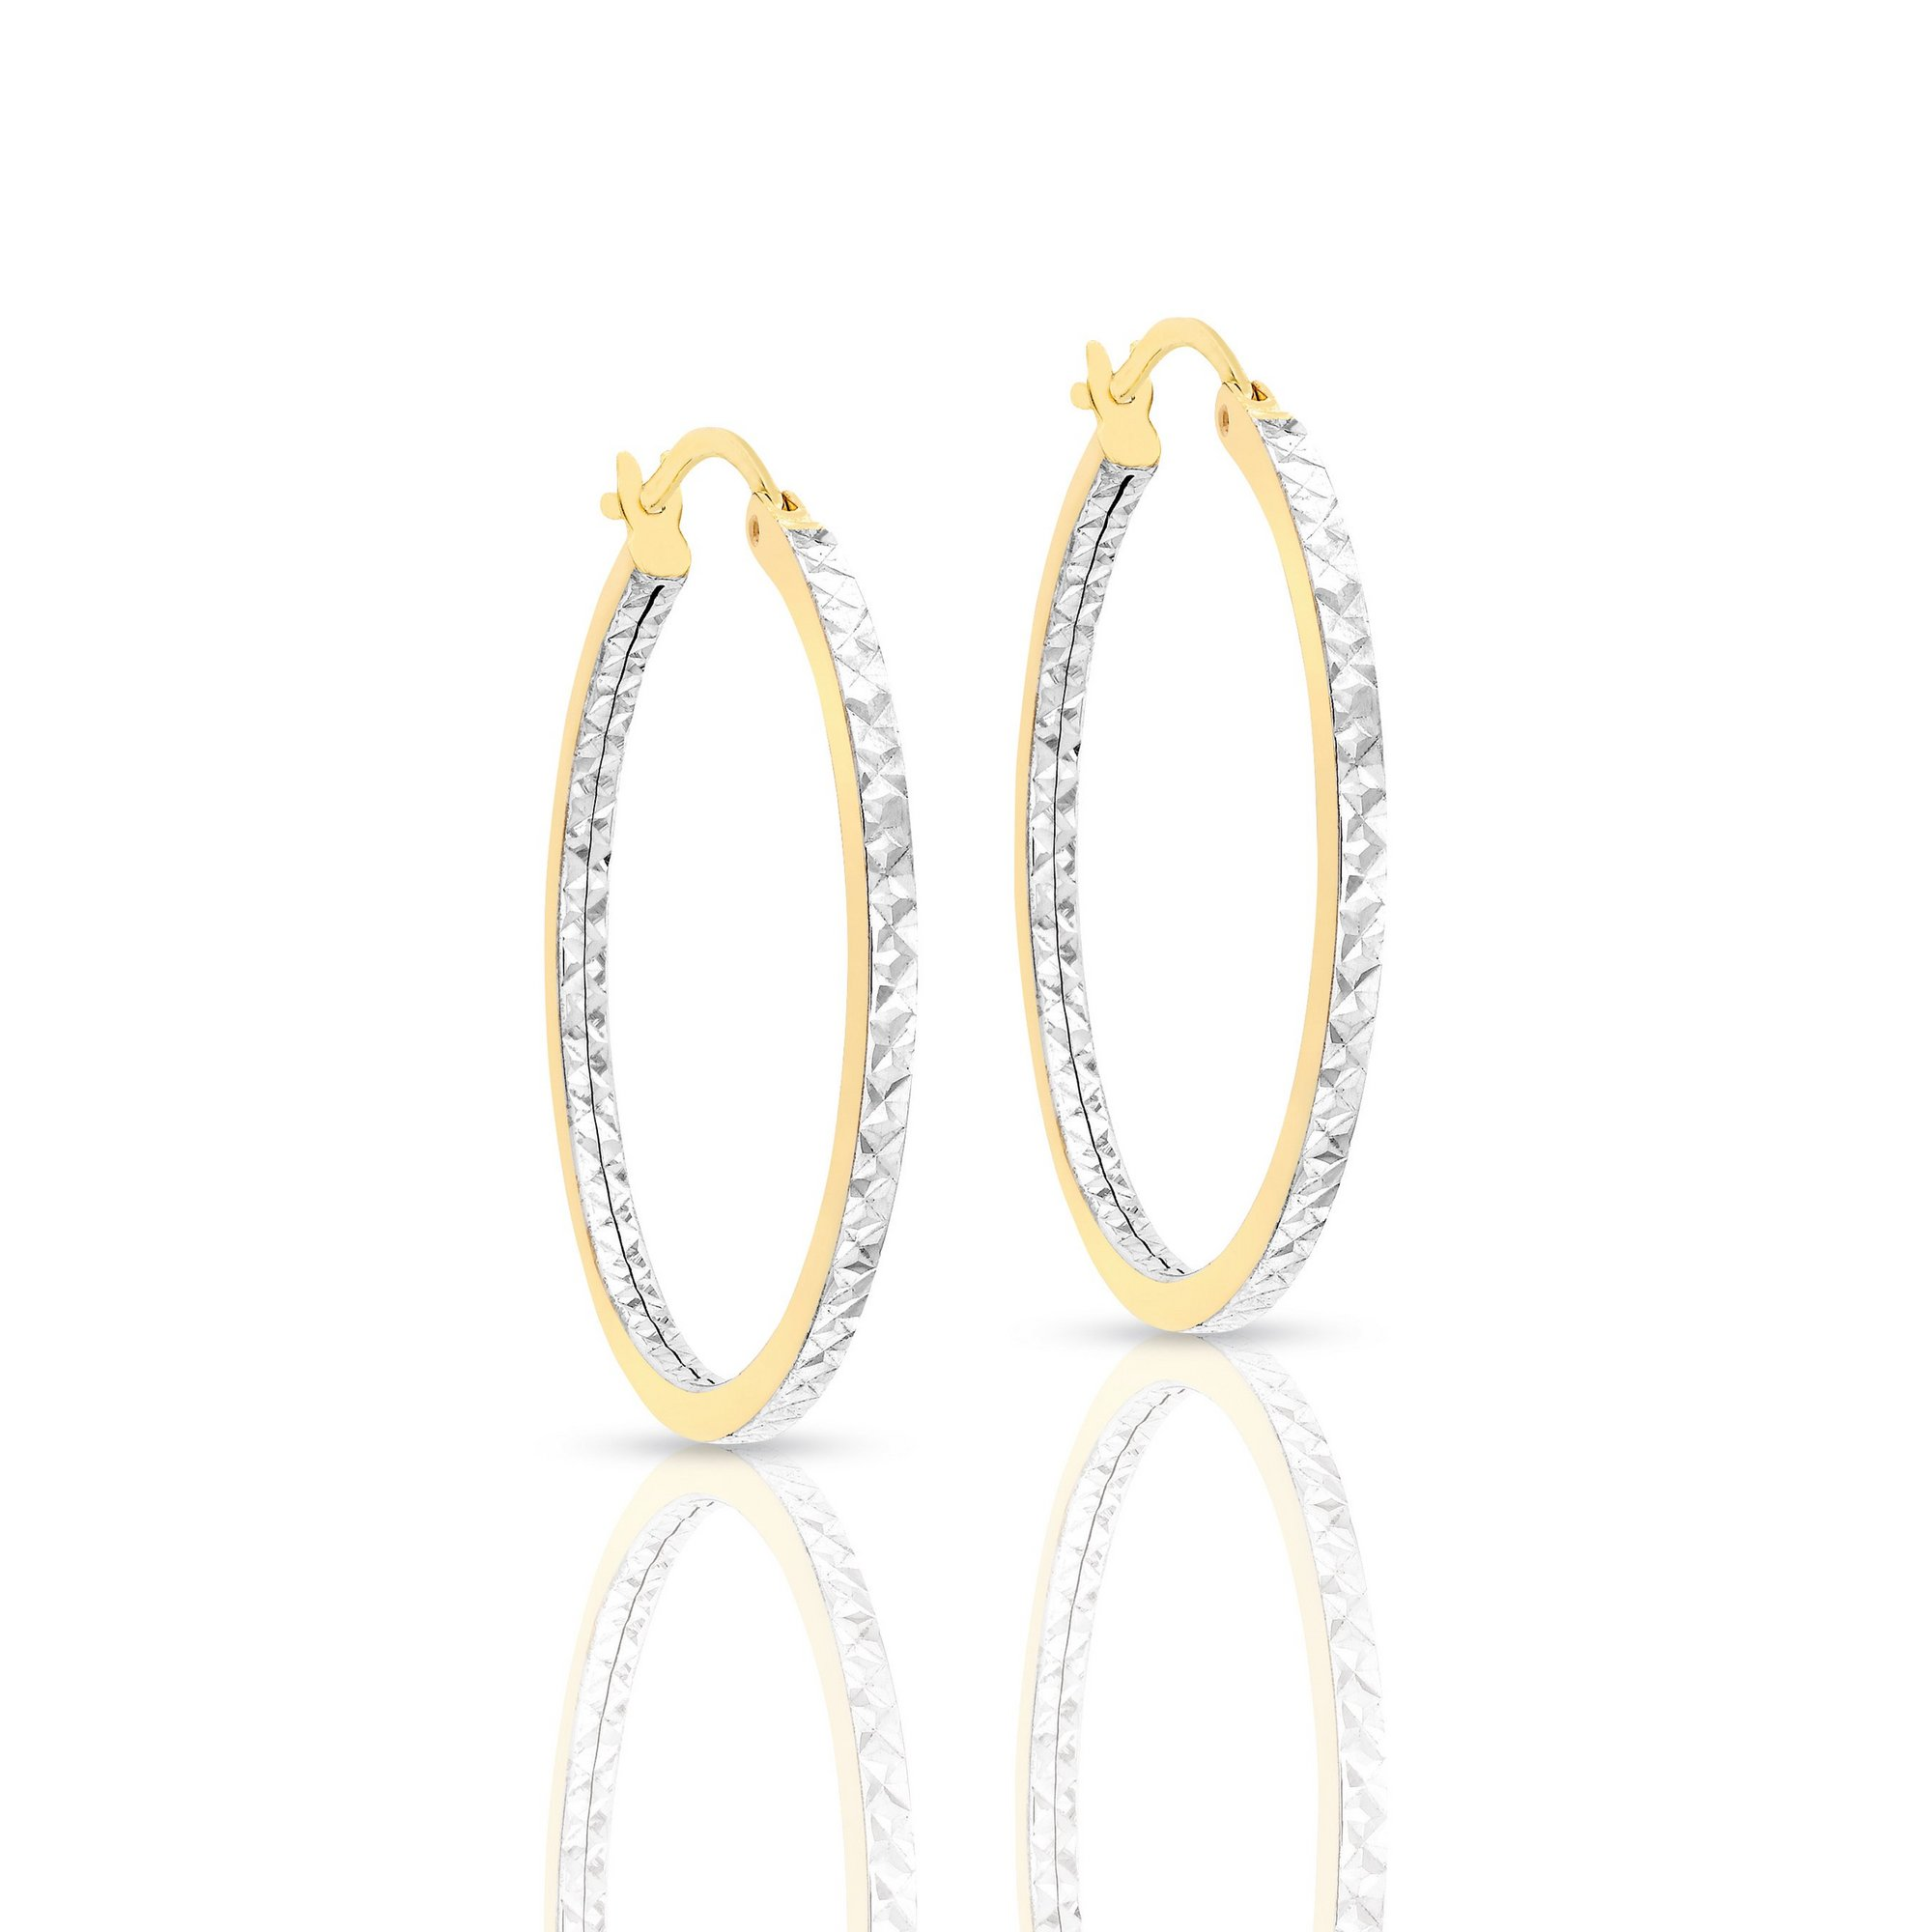 Image of 9ct 2-Tone Gold 28mm Diamond Cut Creole Earrings